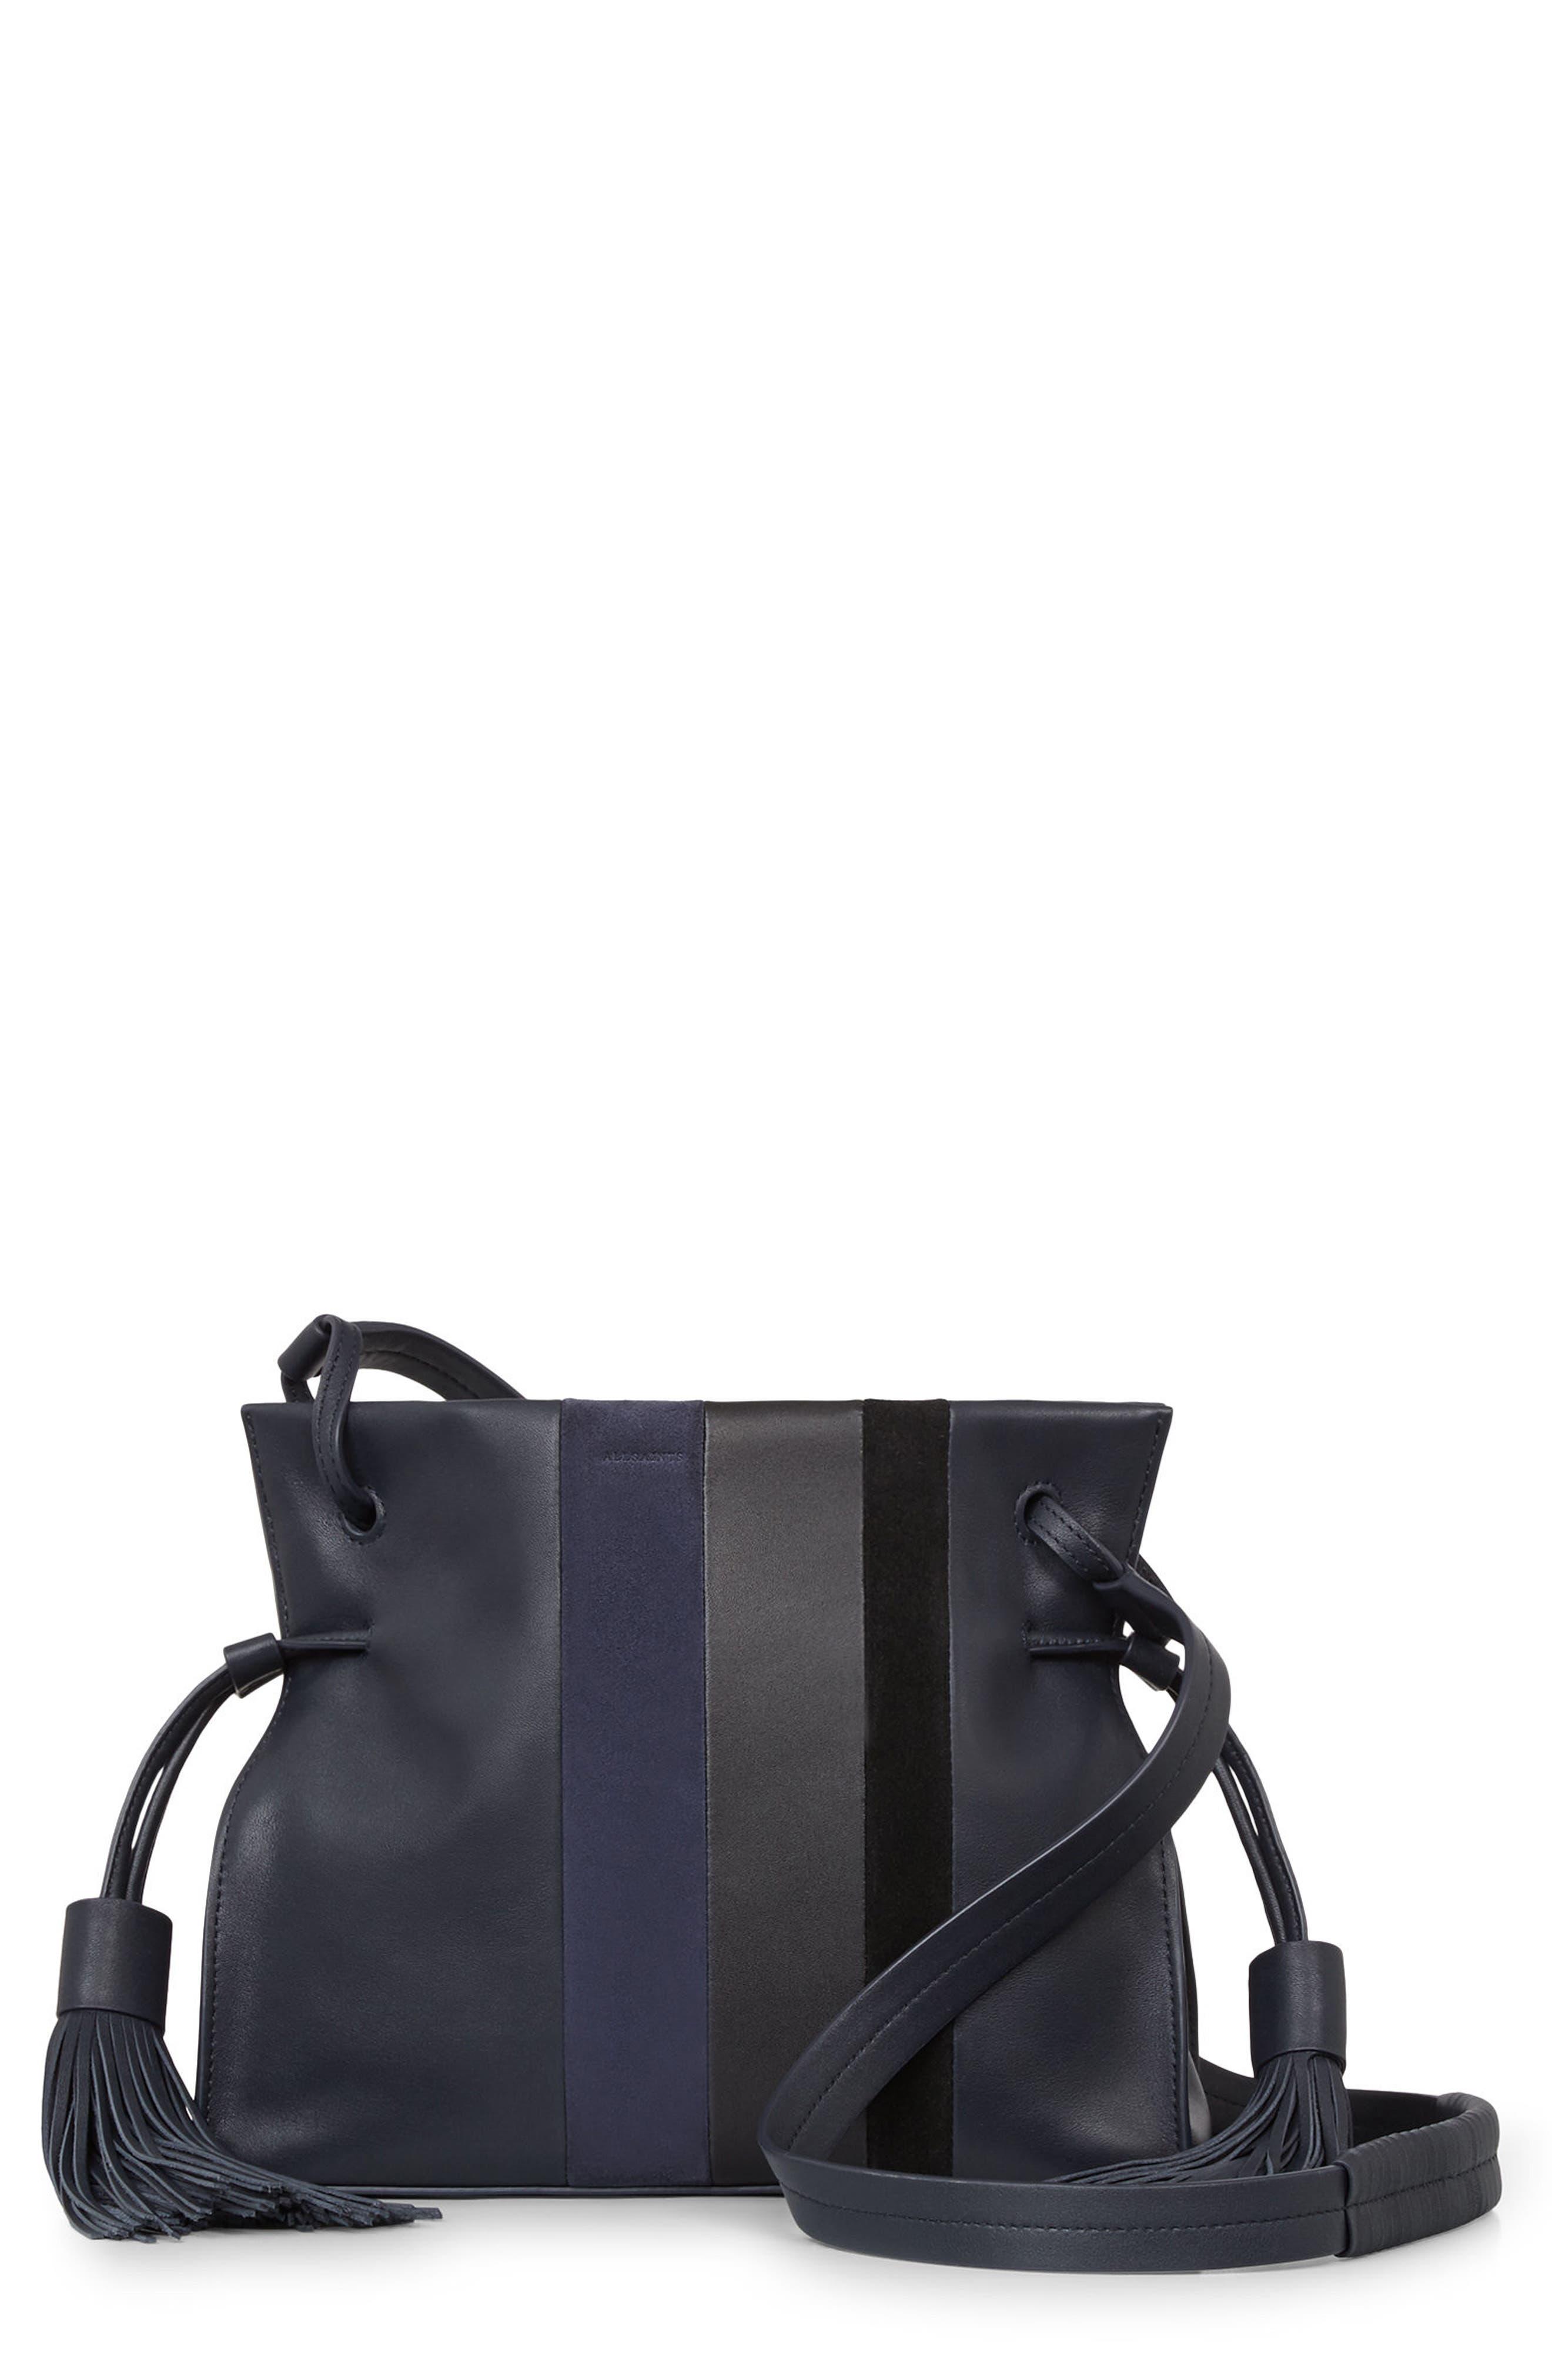 Casey Calfskin Leather & Suede Tassel Crossbody Bag,                             Main thumbnail 1, color,                             405